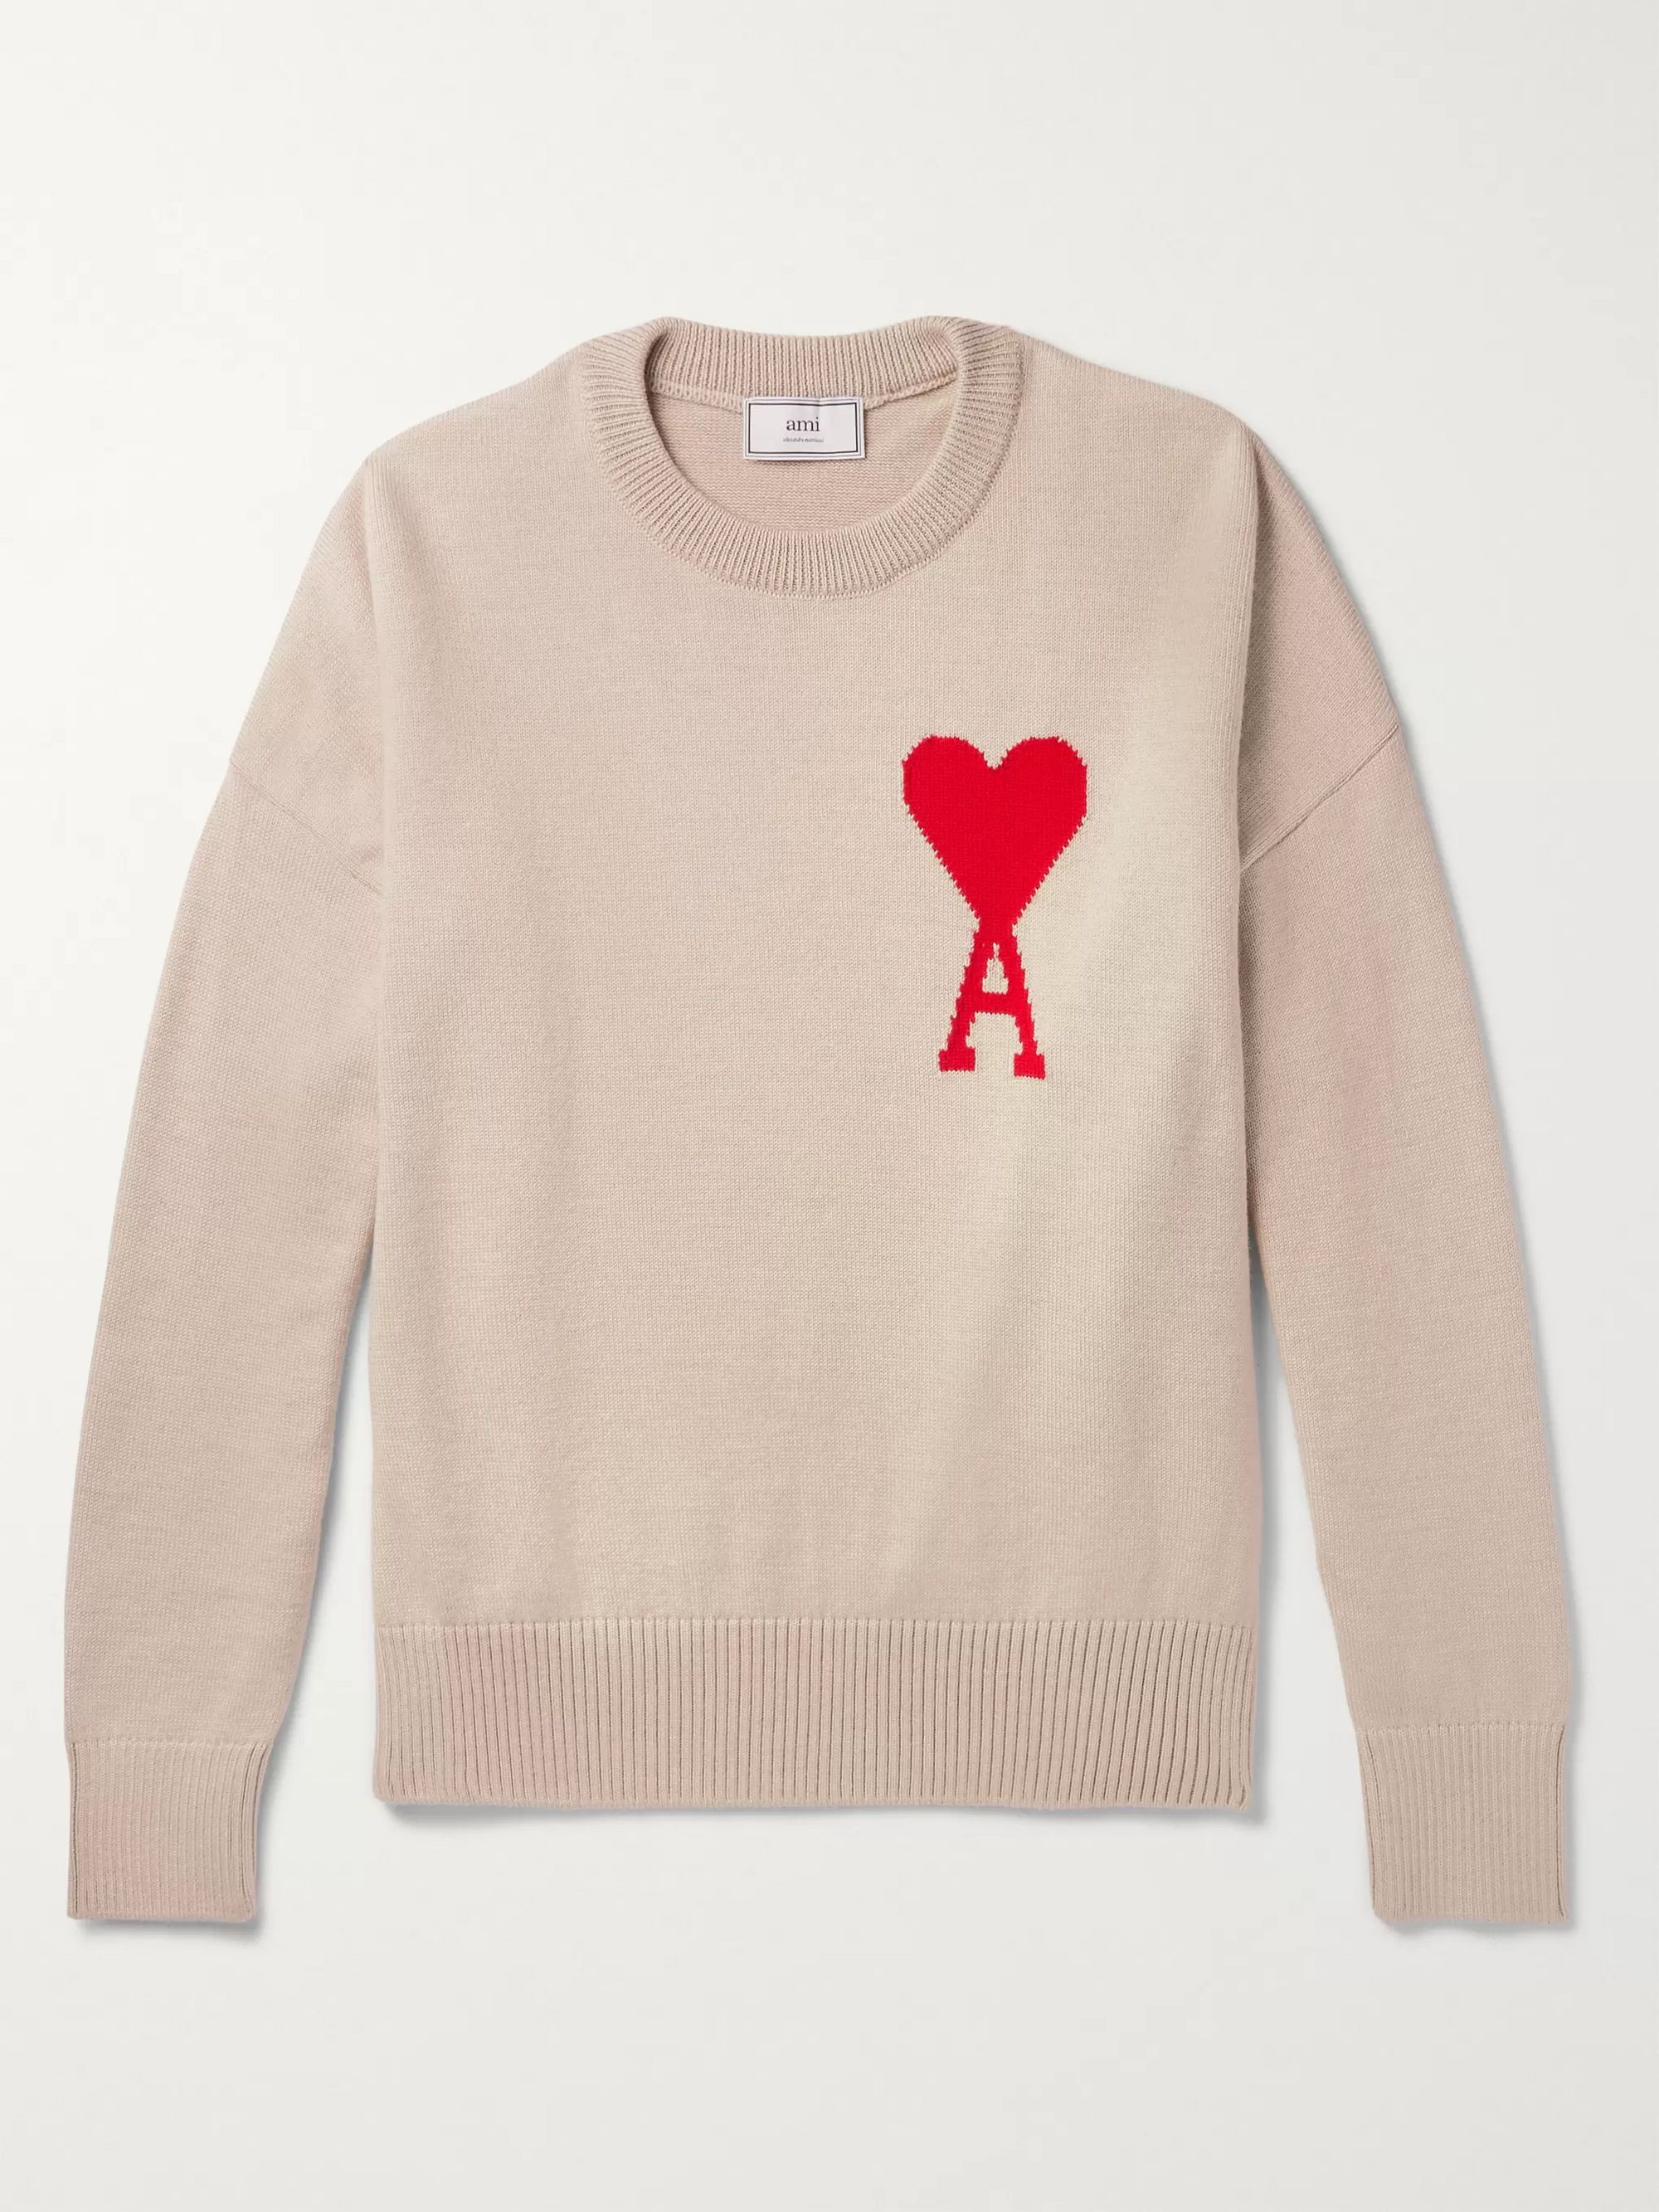 AMI Beige Logo-Intarsia Merino Wool Sweater,Beige